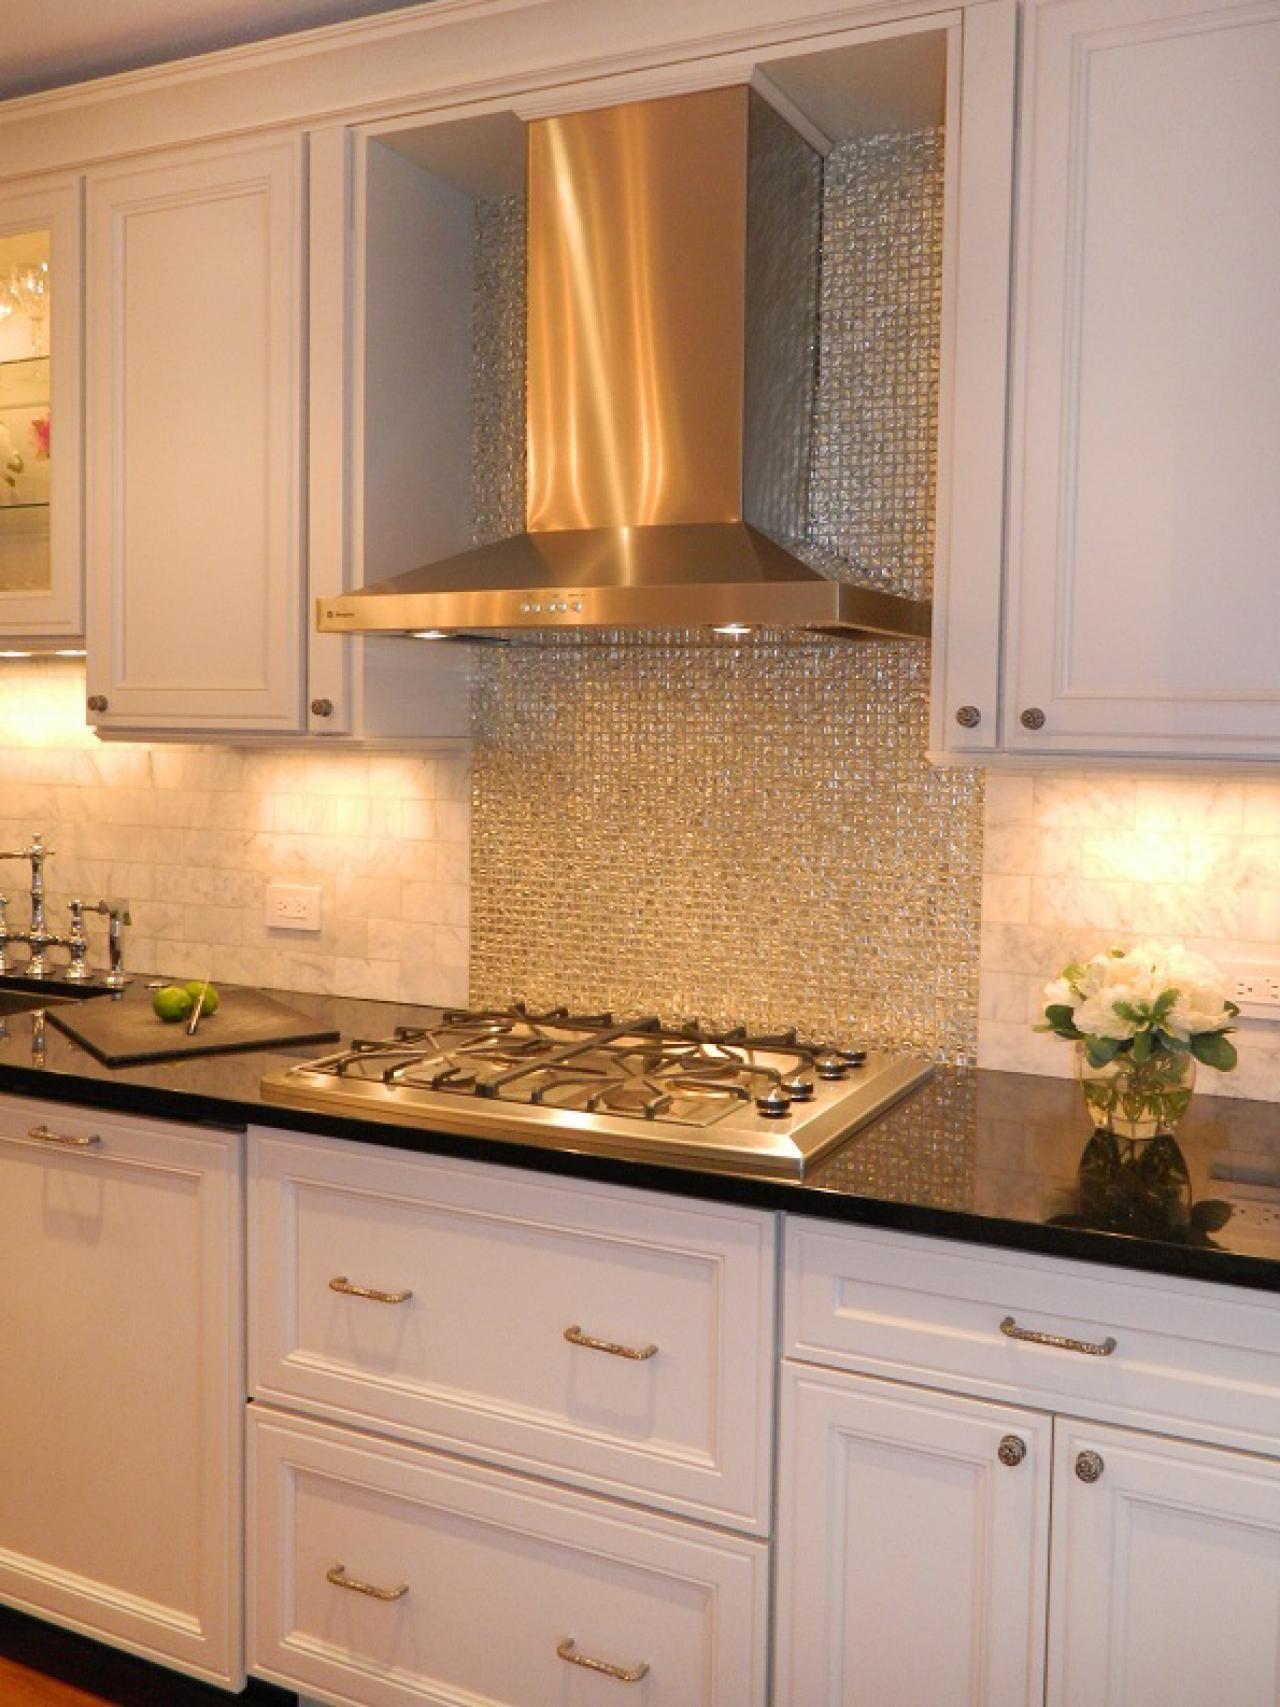 Tiled kitchen backsplash hgtv kitchen pinterest kitchen